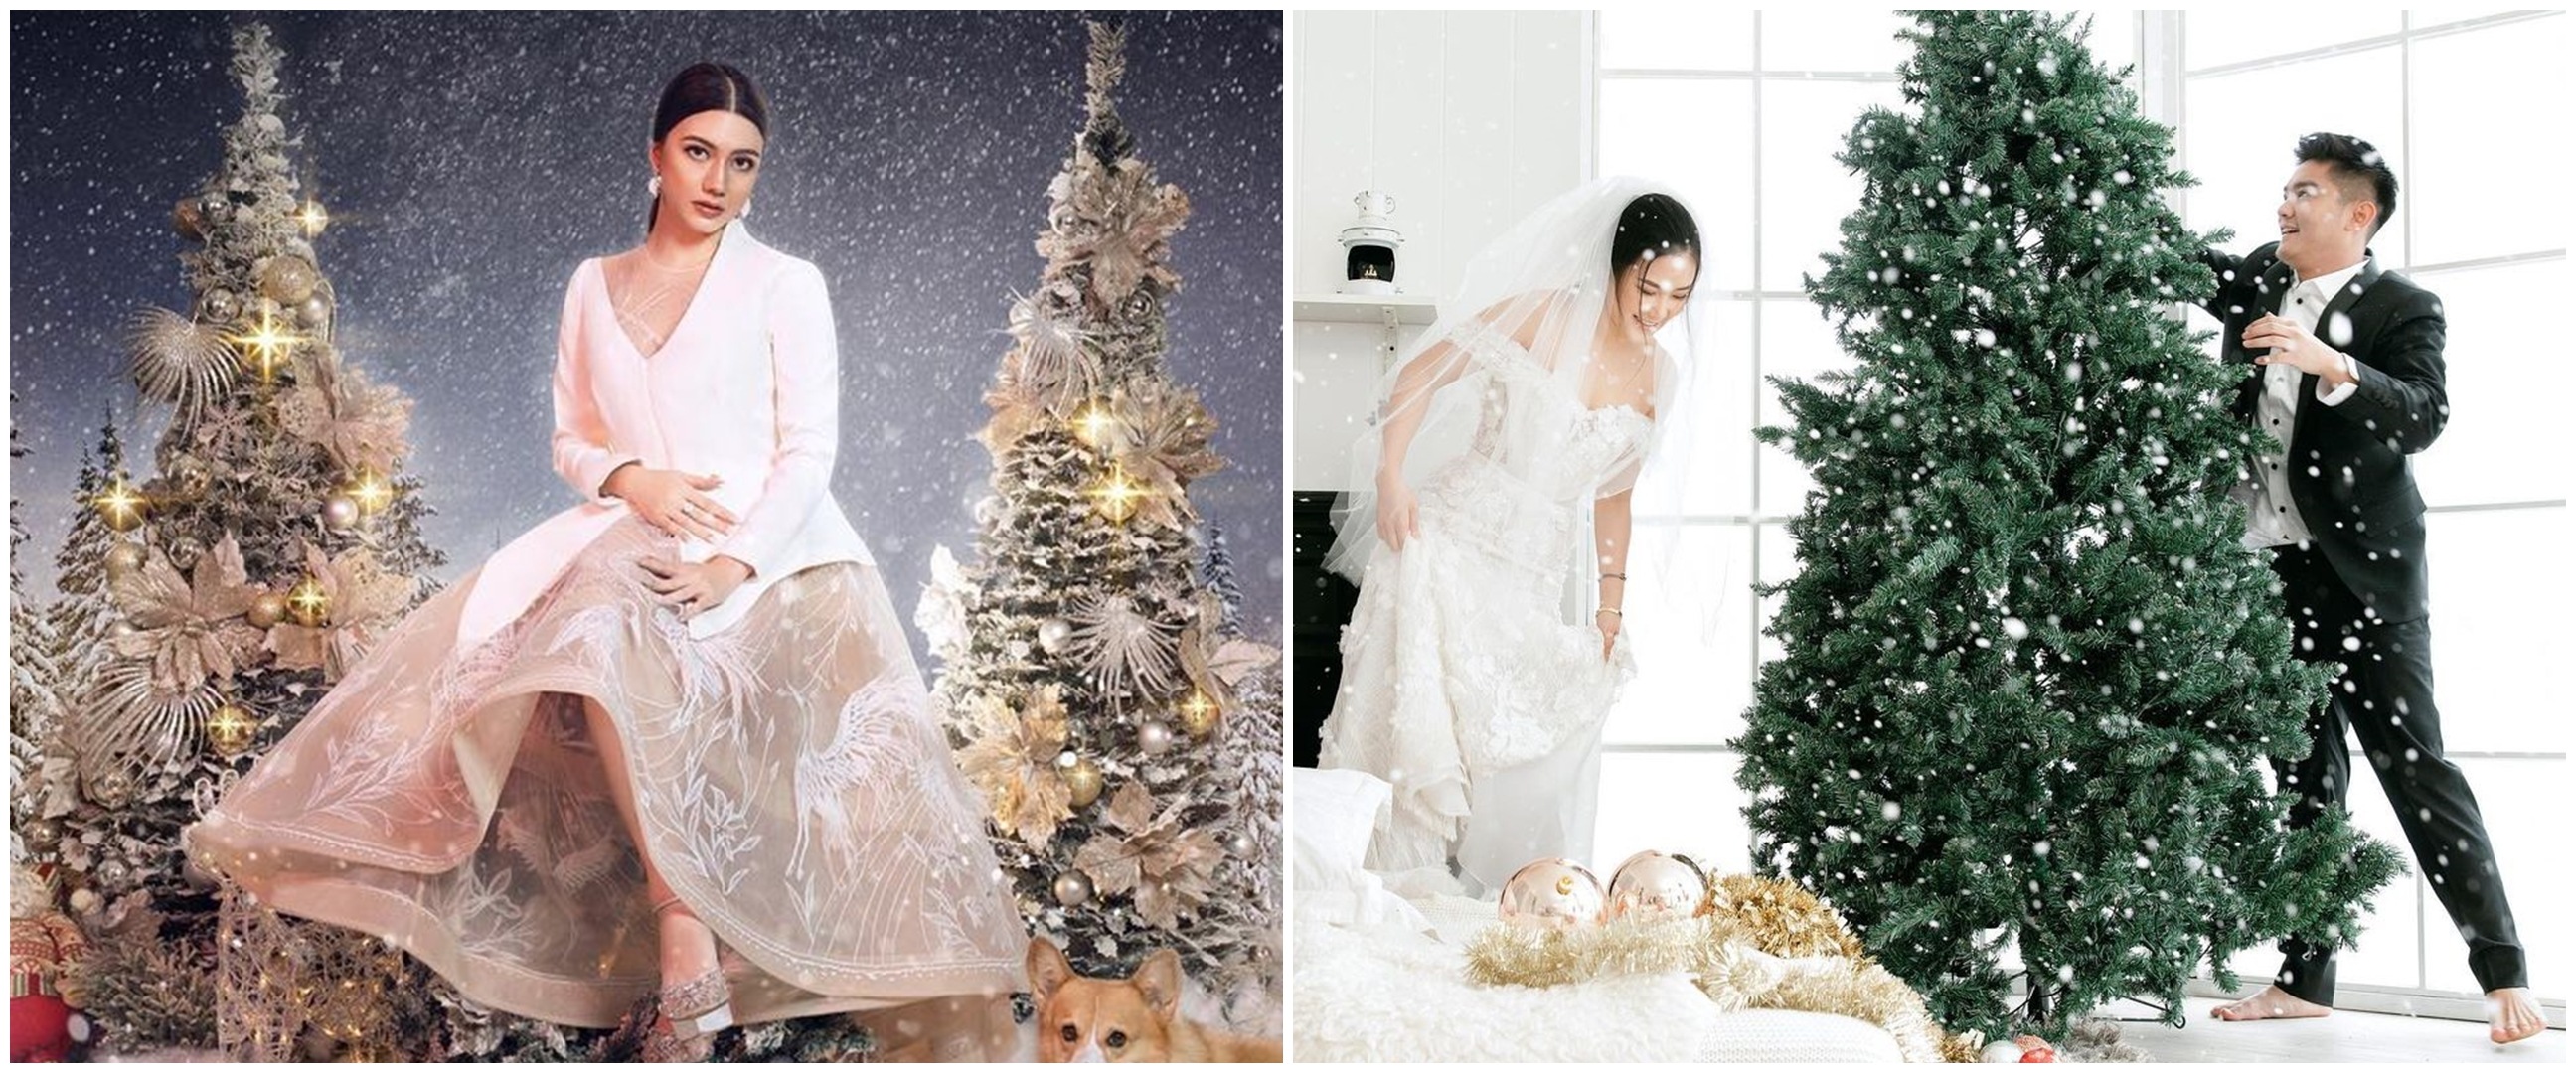 Gaya 12 seleb pemotretan bertema Natal, glamor hingga romantis